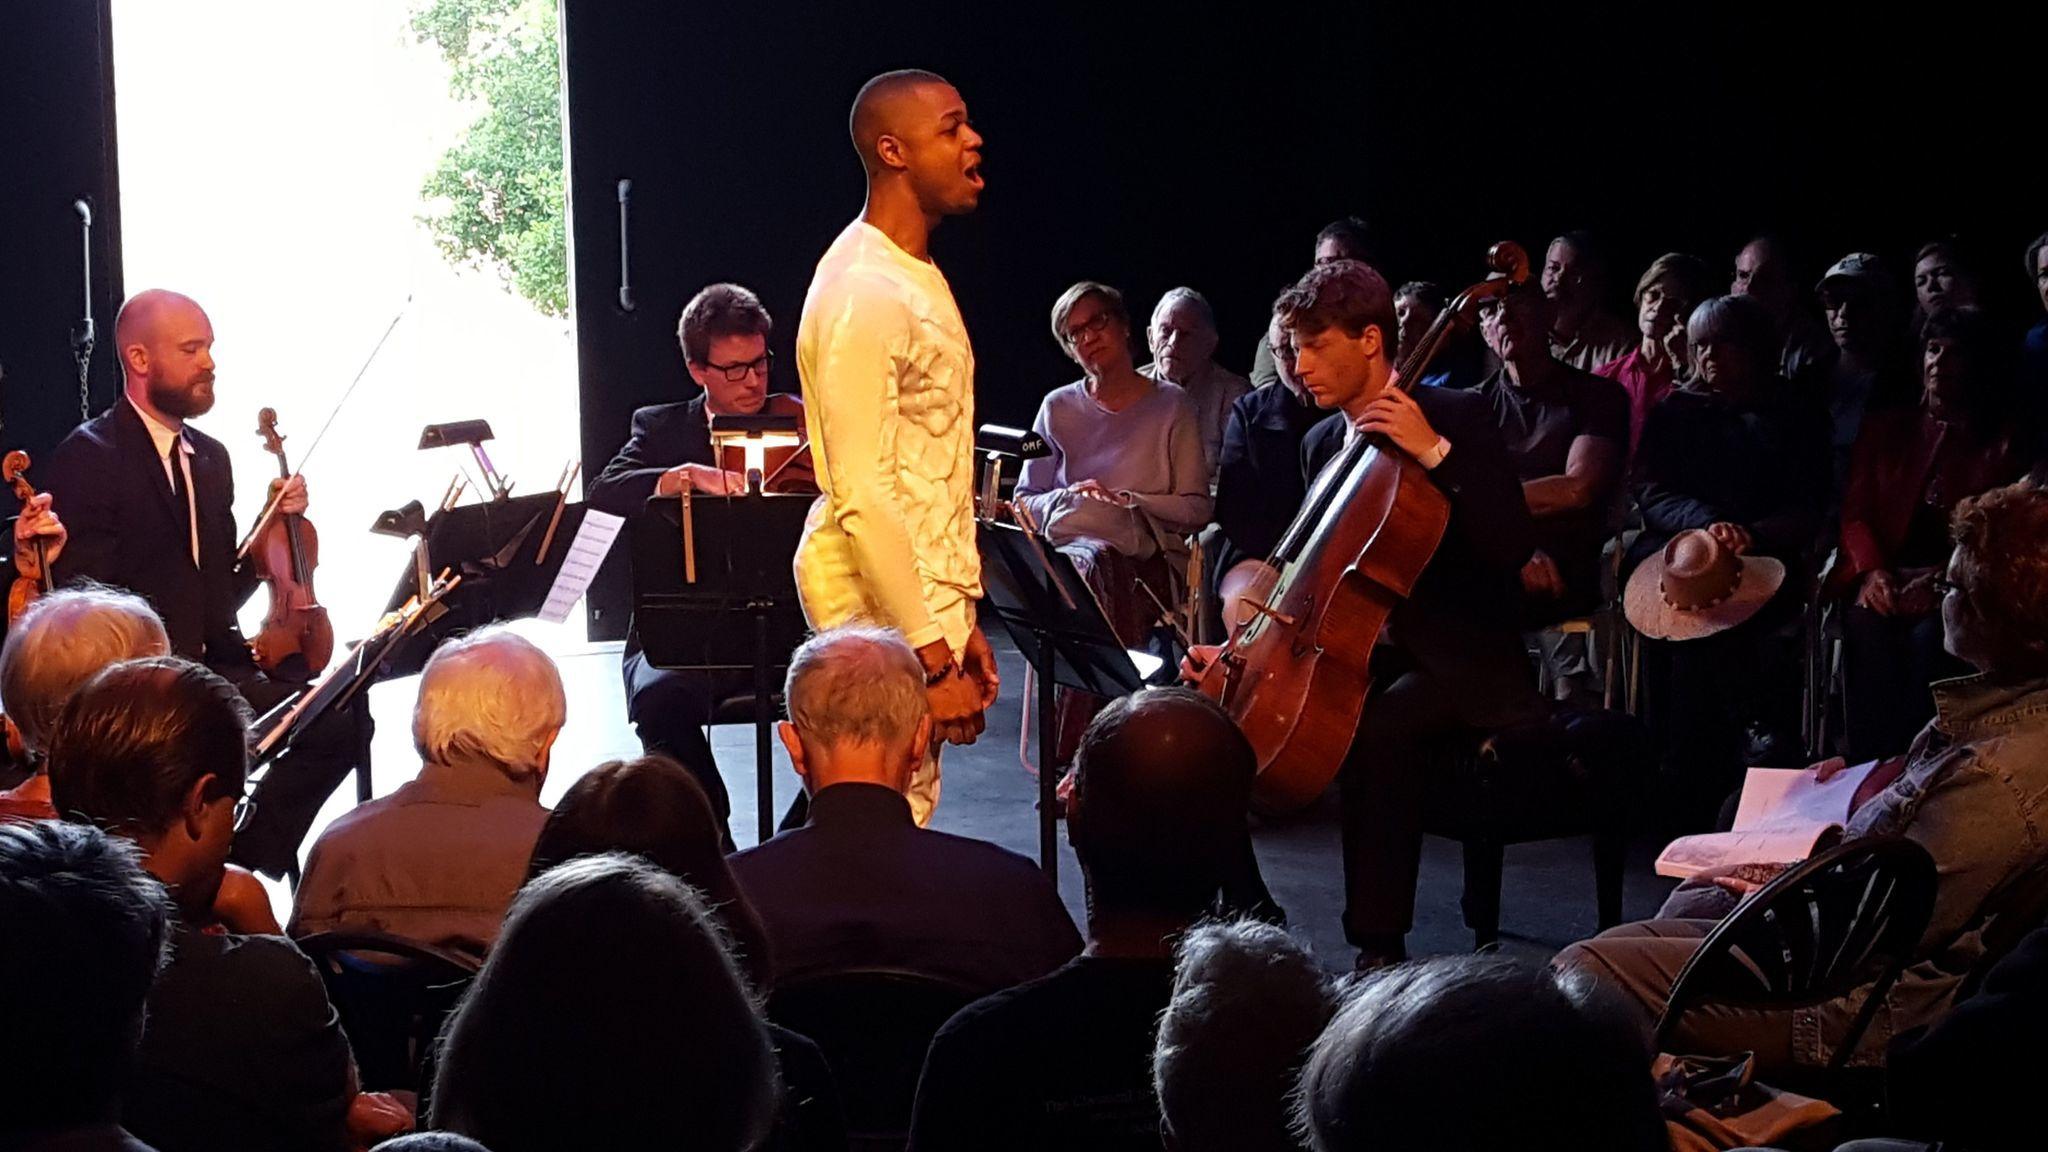 Davone Tines singing with the Calder Quartet at the Ojai festival.